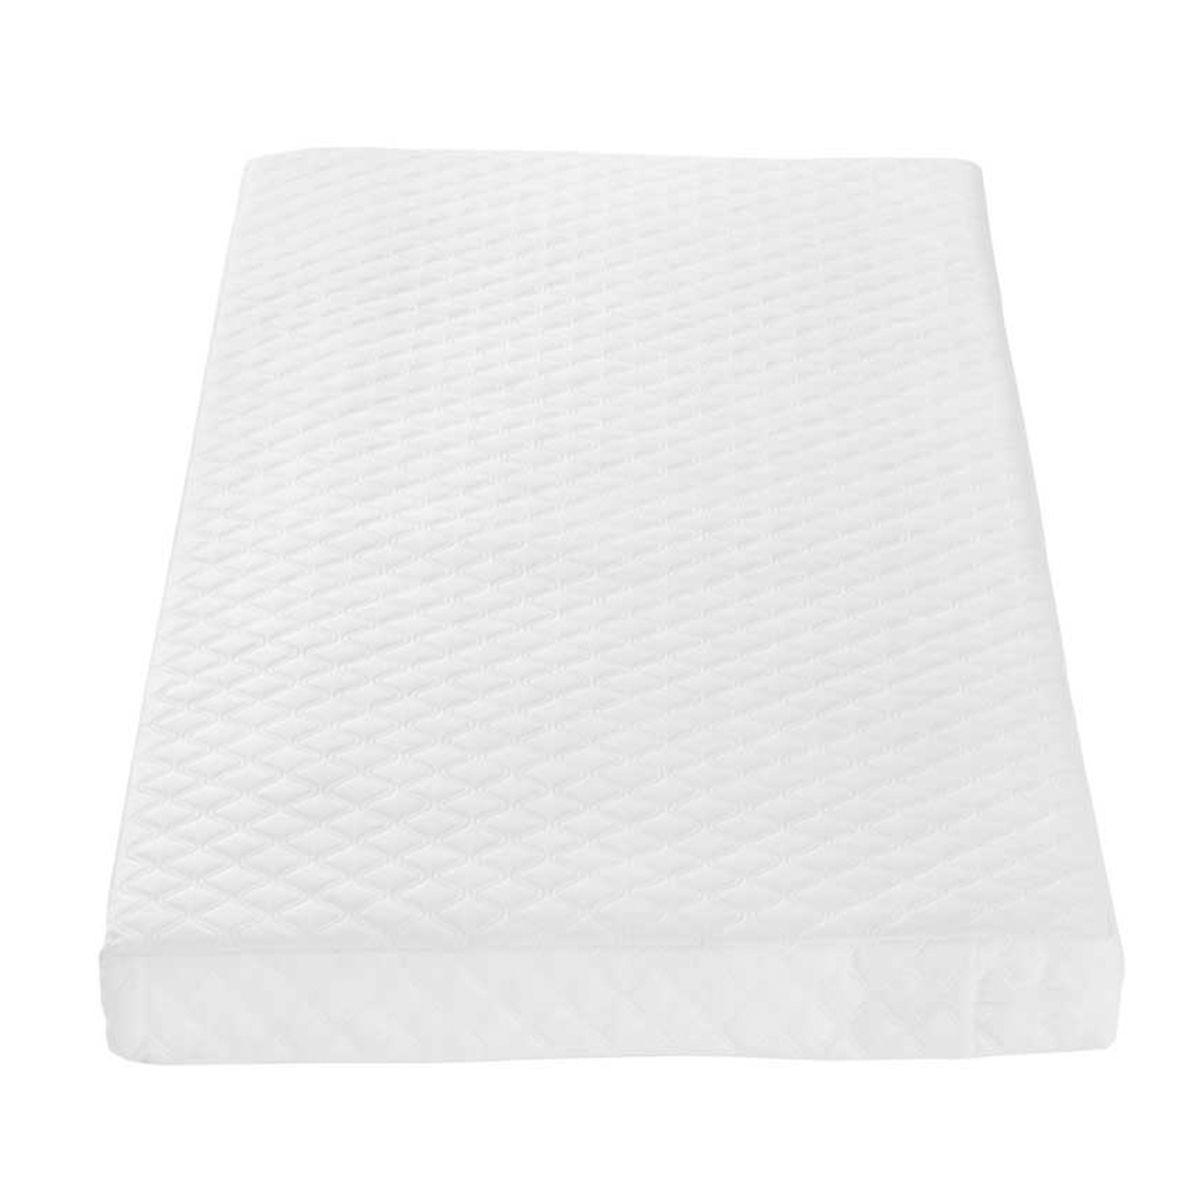 Tutti Bambini Sprung Cot Mattress (70 x 140cm) - White